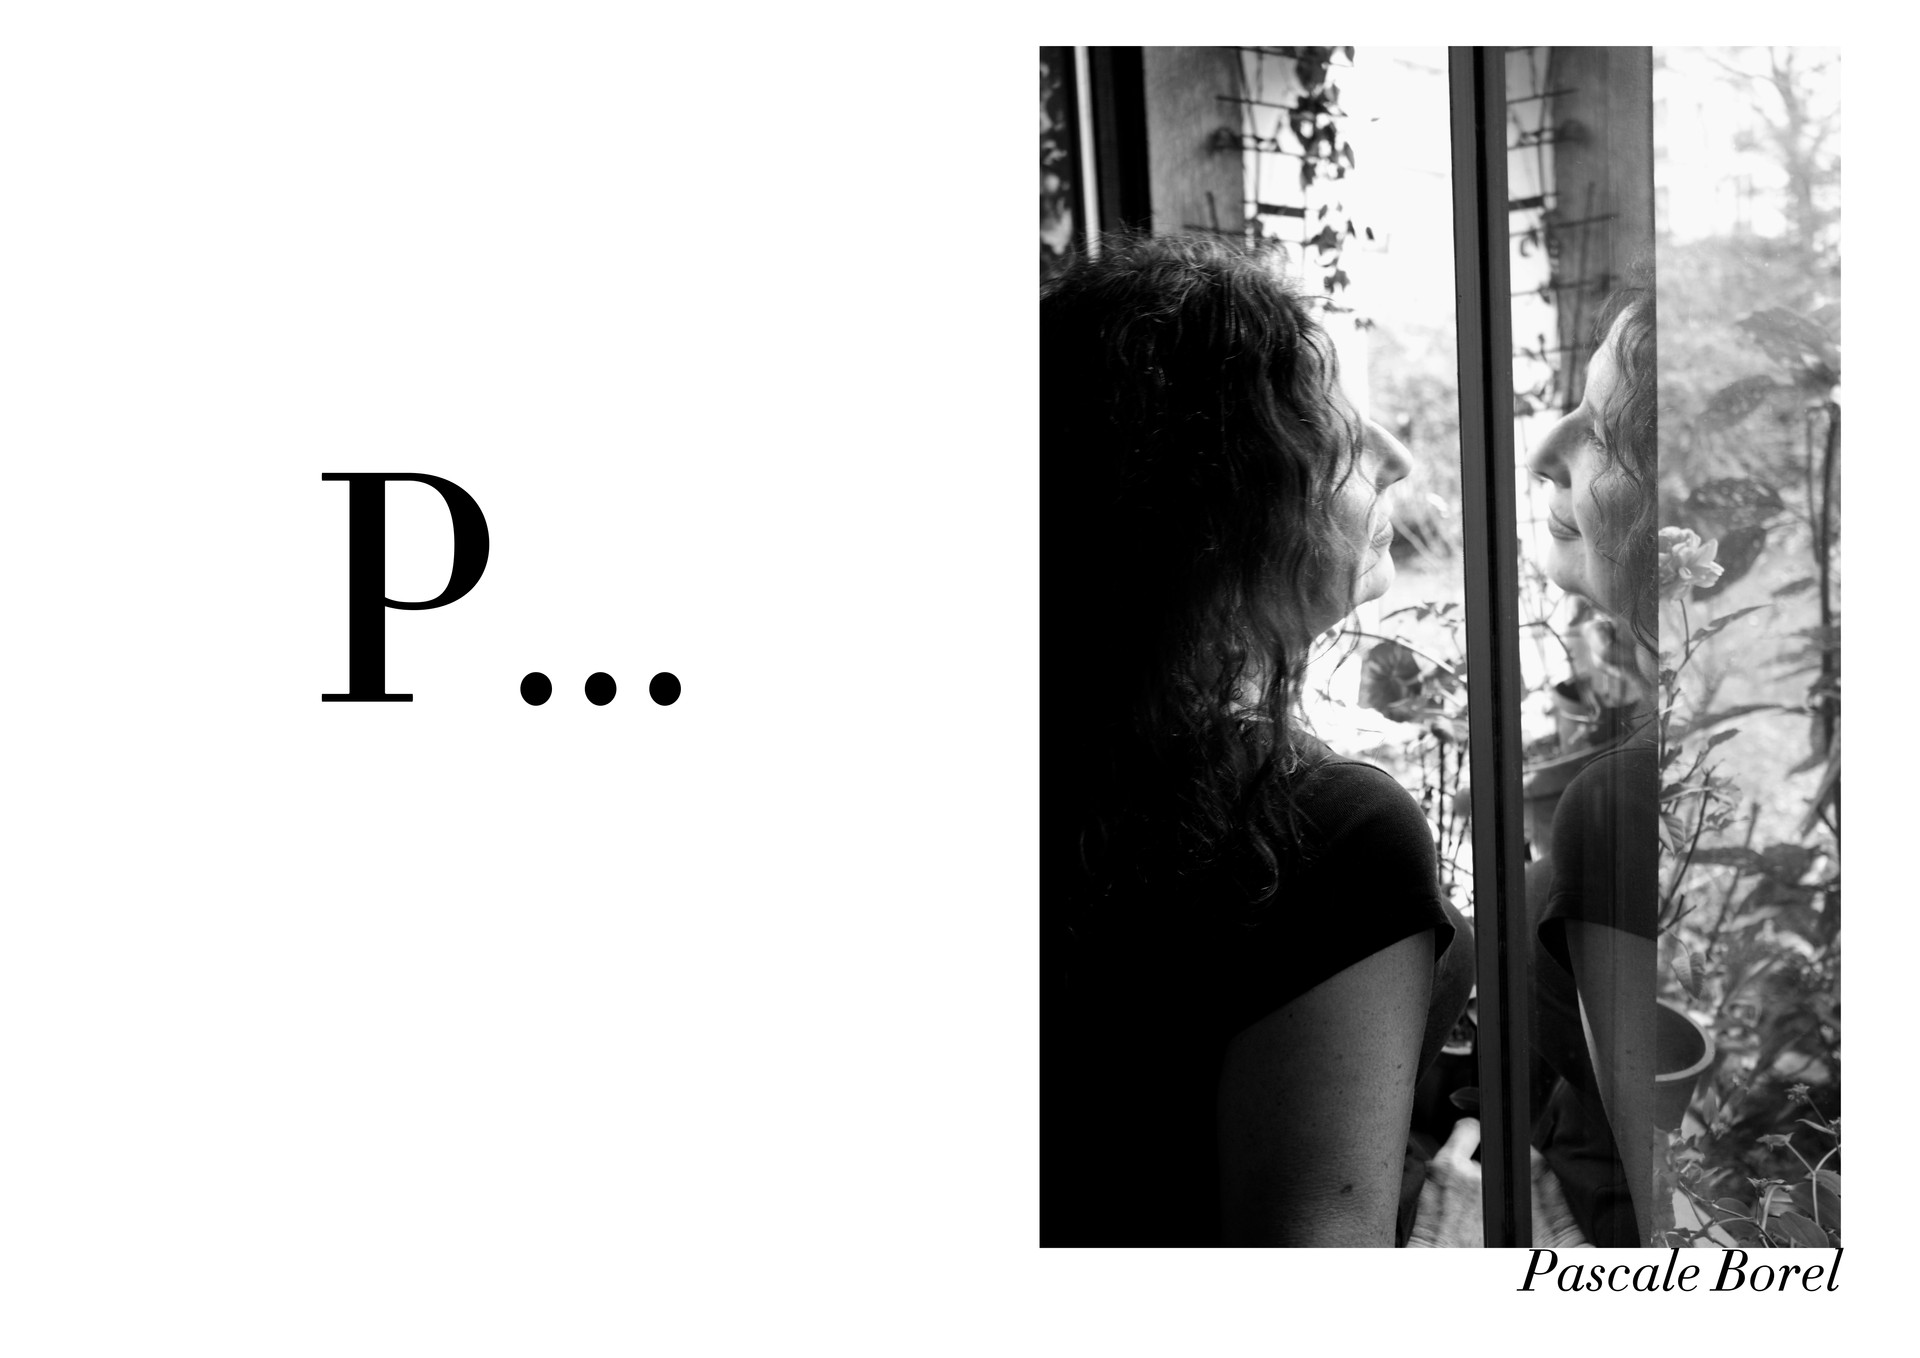 Pascale Borel par Nicolas Vidal  #chanteusesdefrance